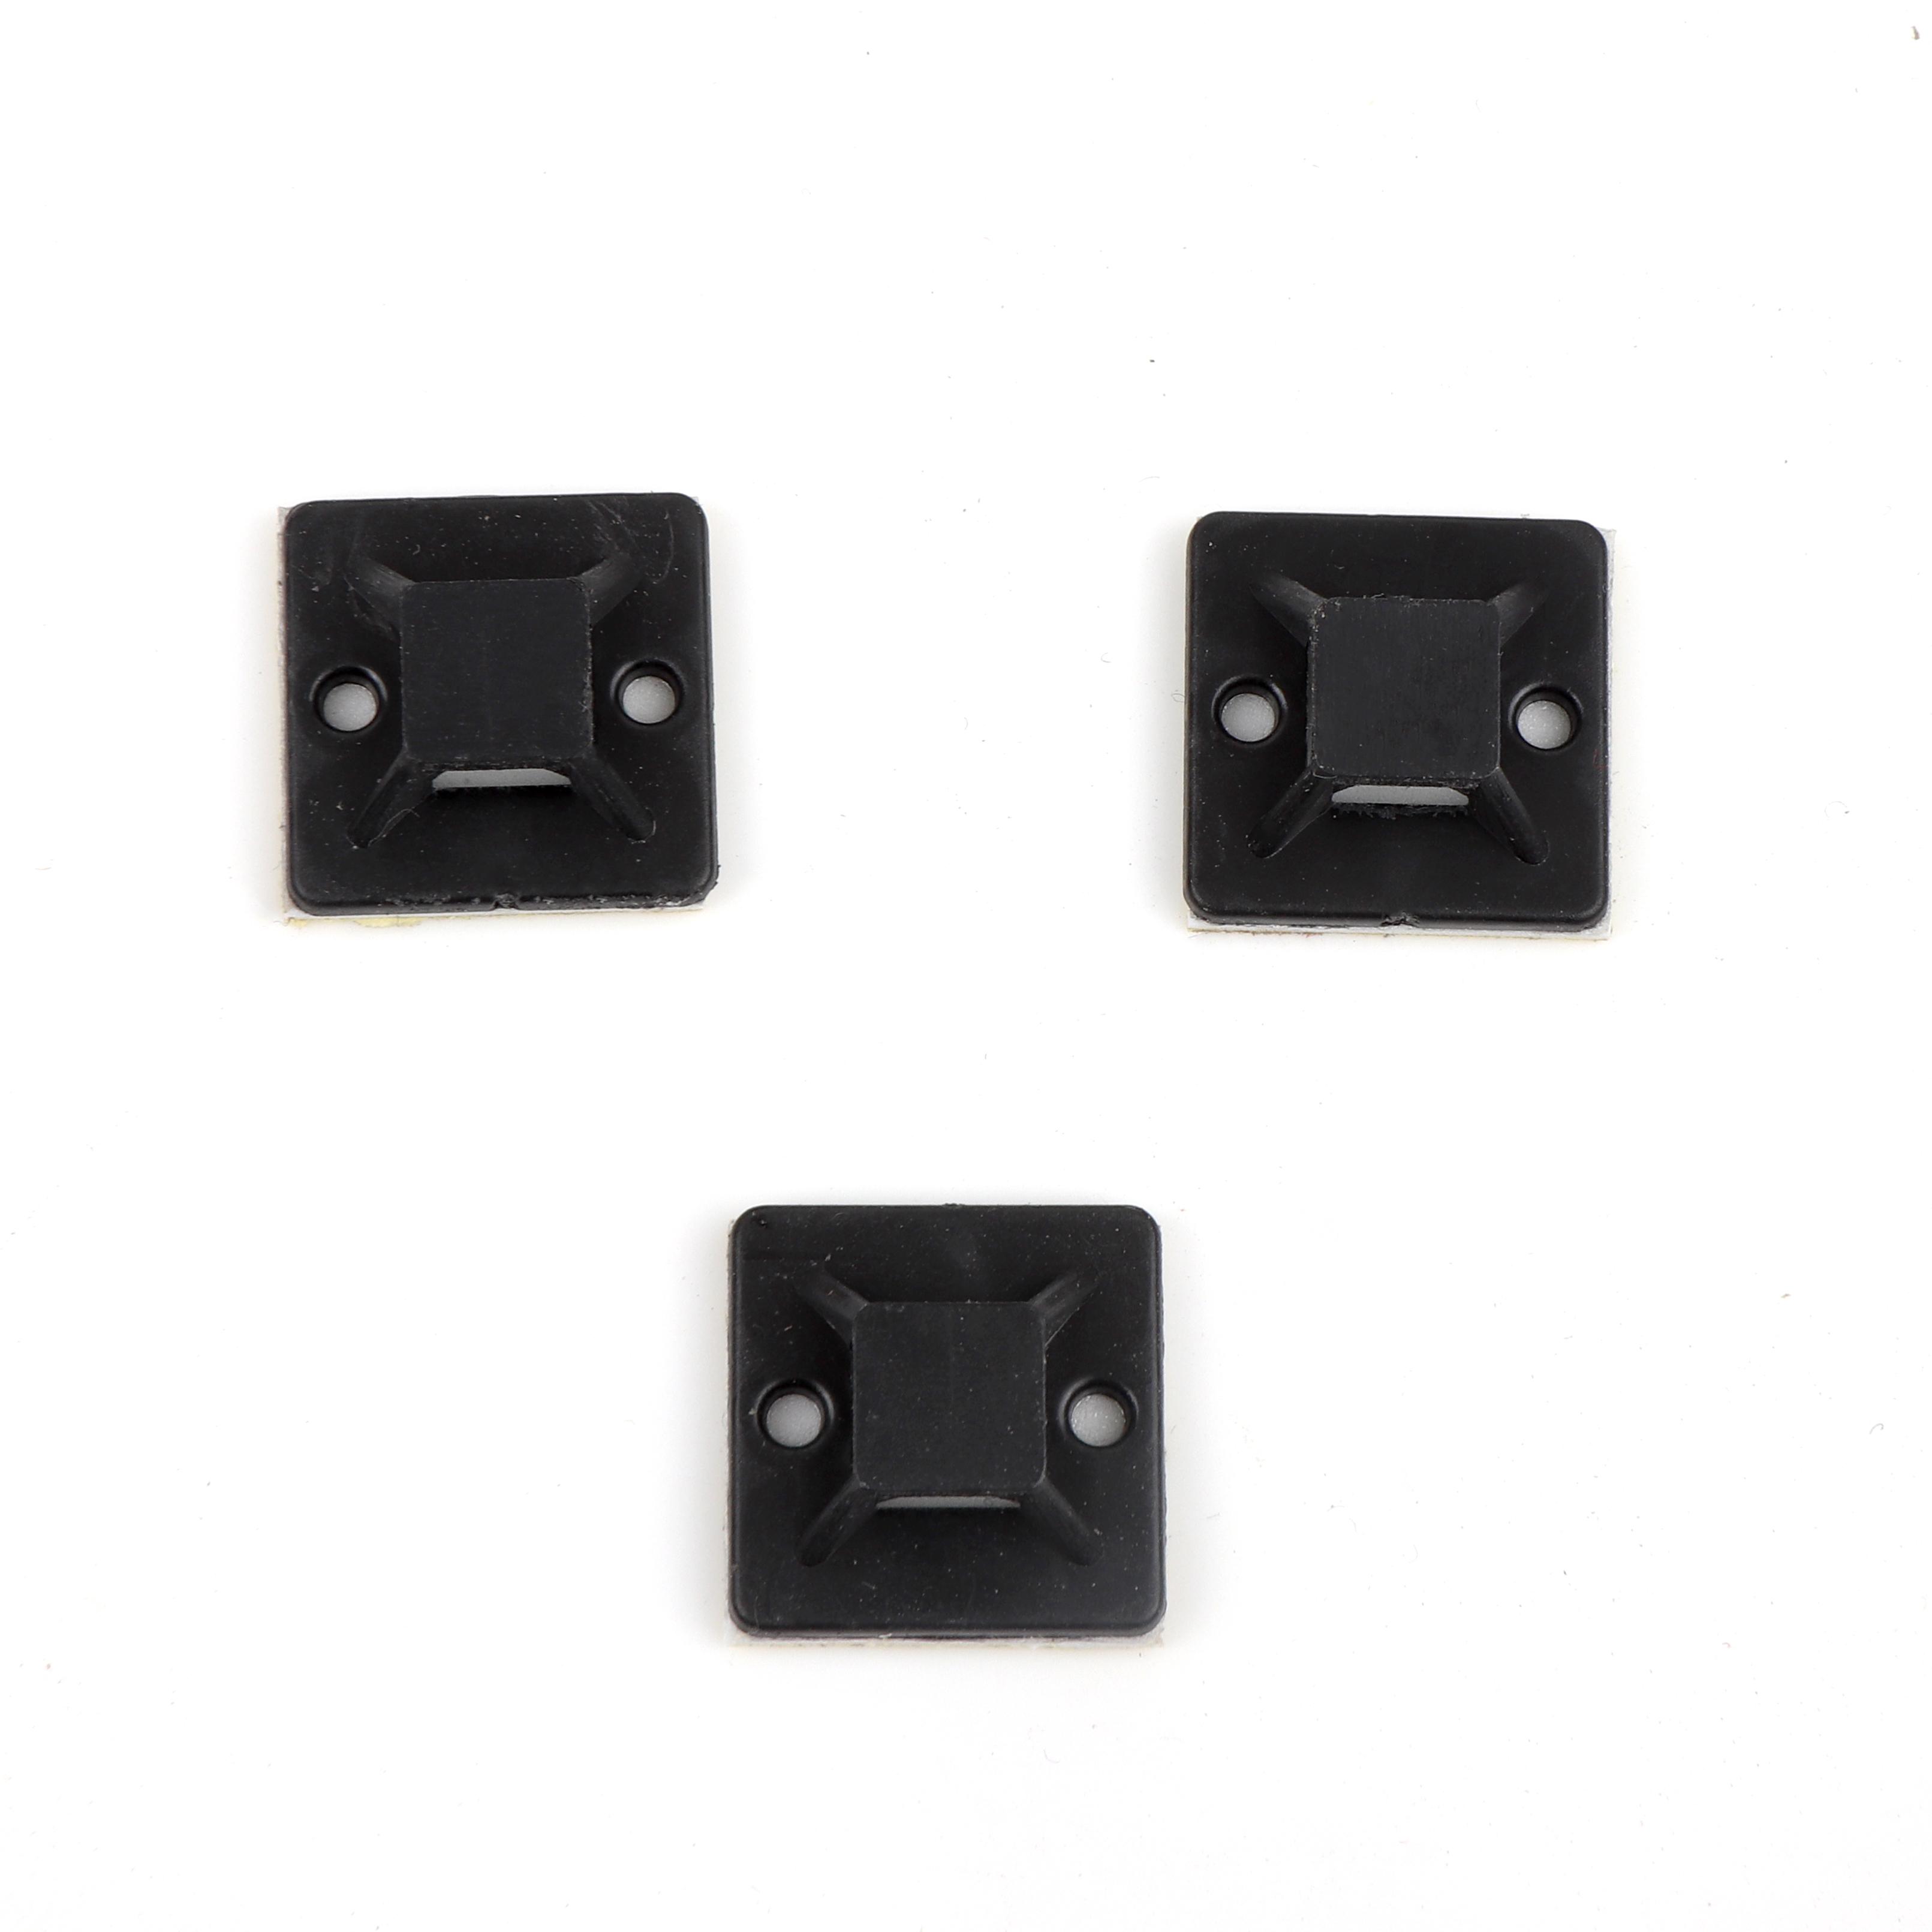 self adhesive tie mount High quality nylon wall self-adhesive cable tie base cable tie base